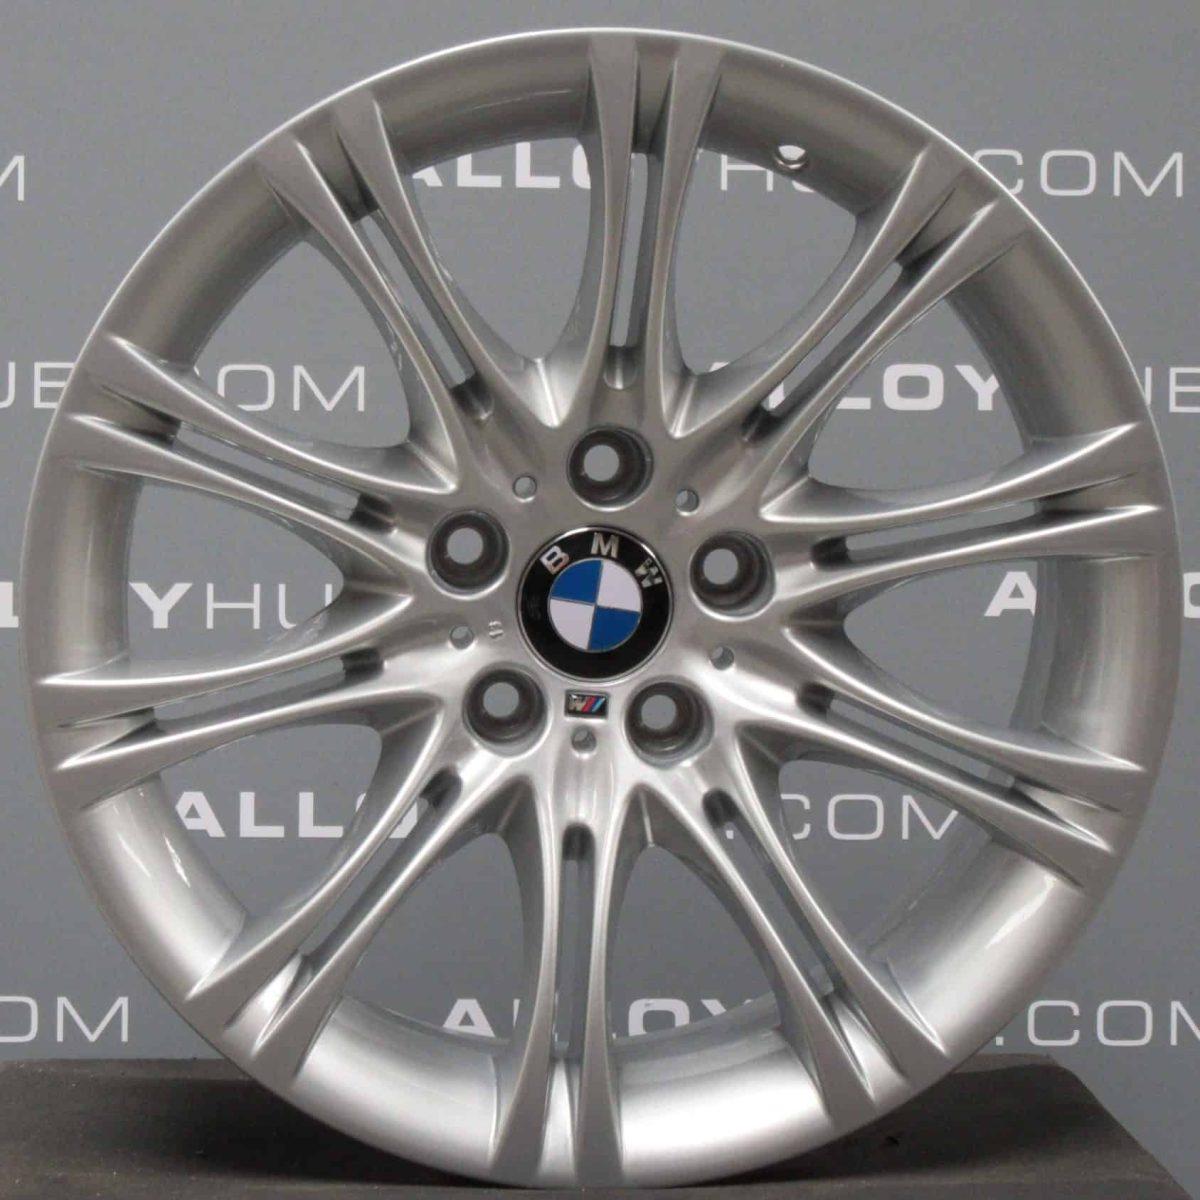 "Genuine BMW 5 Series E60 E61 Style 135M Sport MV2 18"" inch 10 Spoke Alloy Wheels with Silver Finish 3611036947"